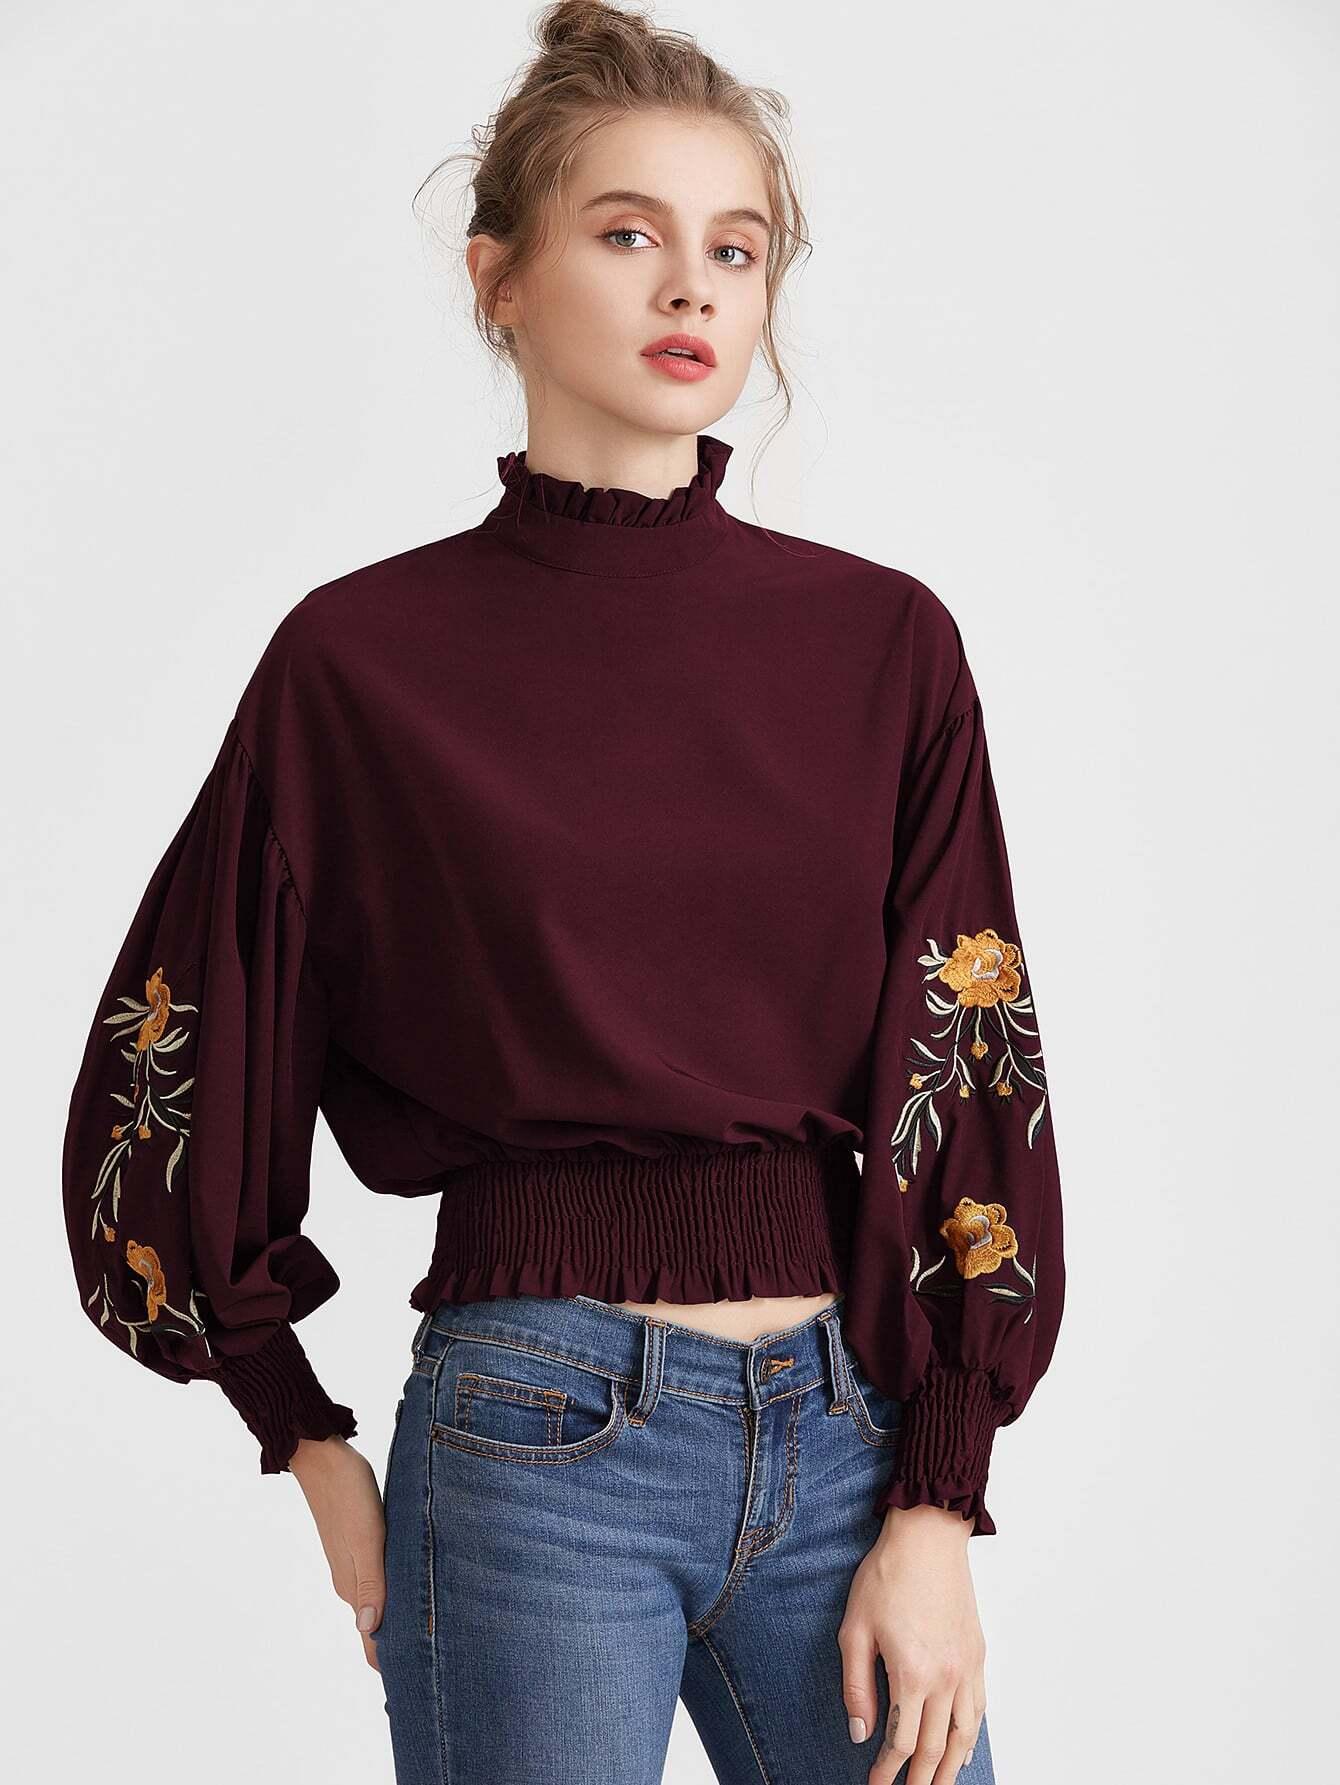 blouse170510105_2